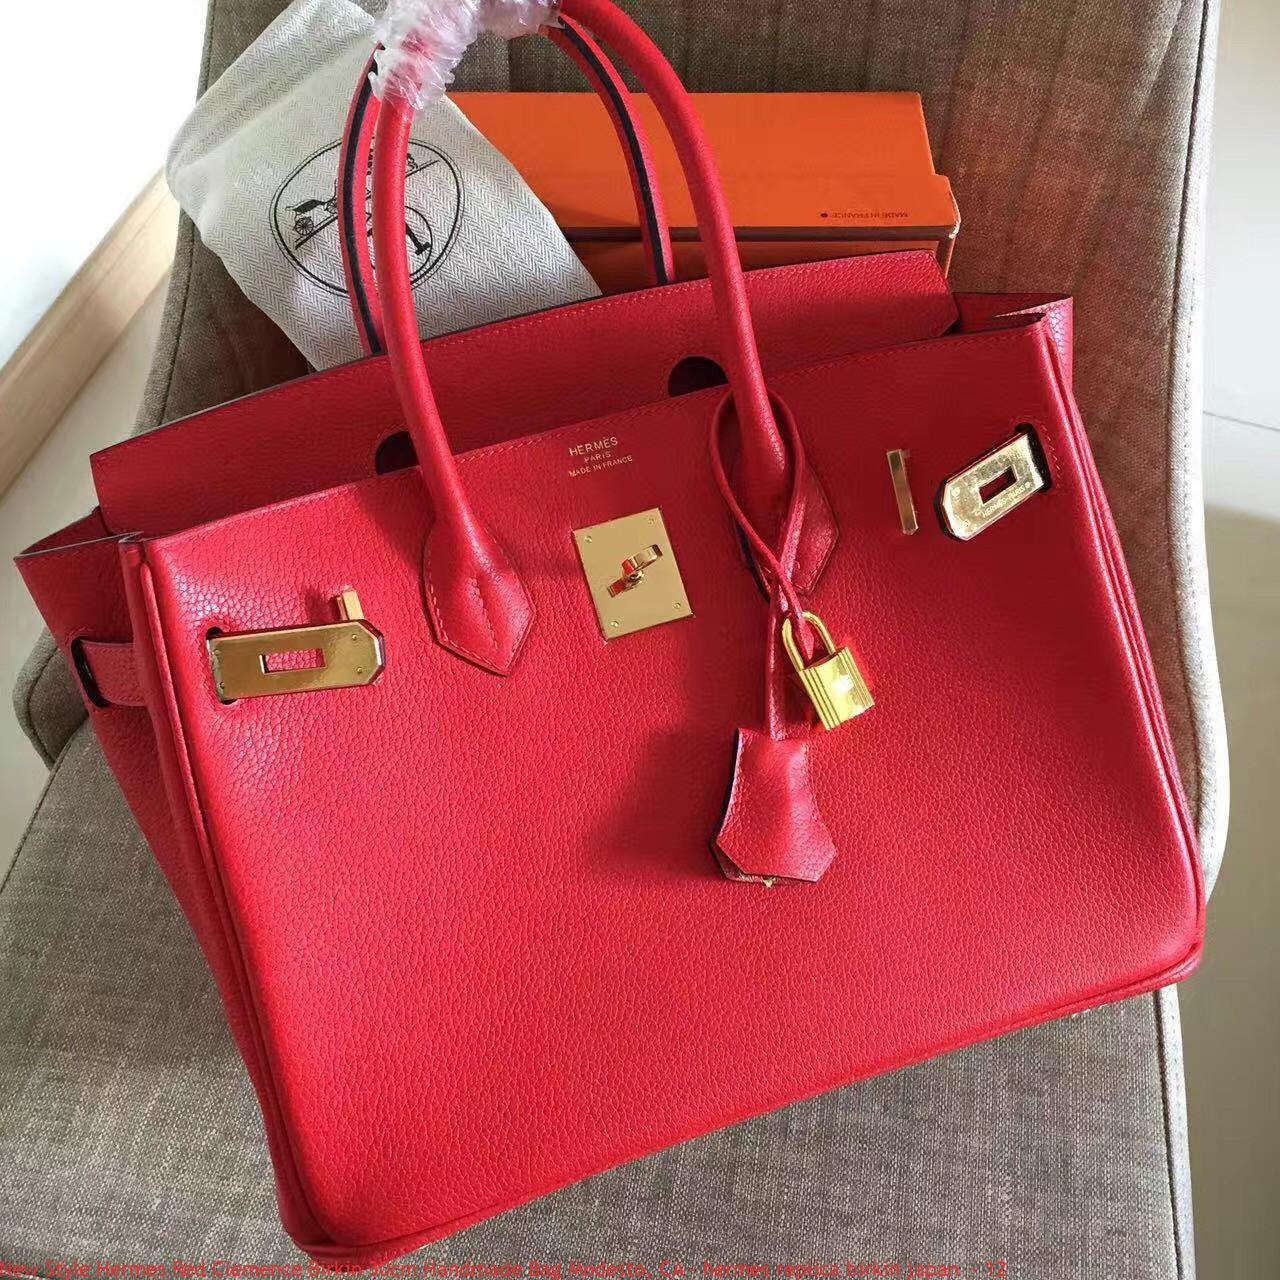 New Style Hermes Red Clemence Birkin 30cm Handmade Bag Modesto f1f463c114a22